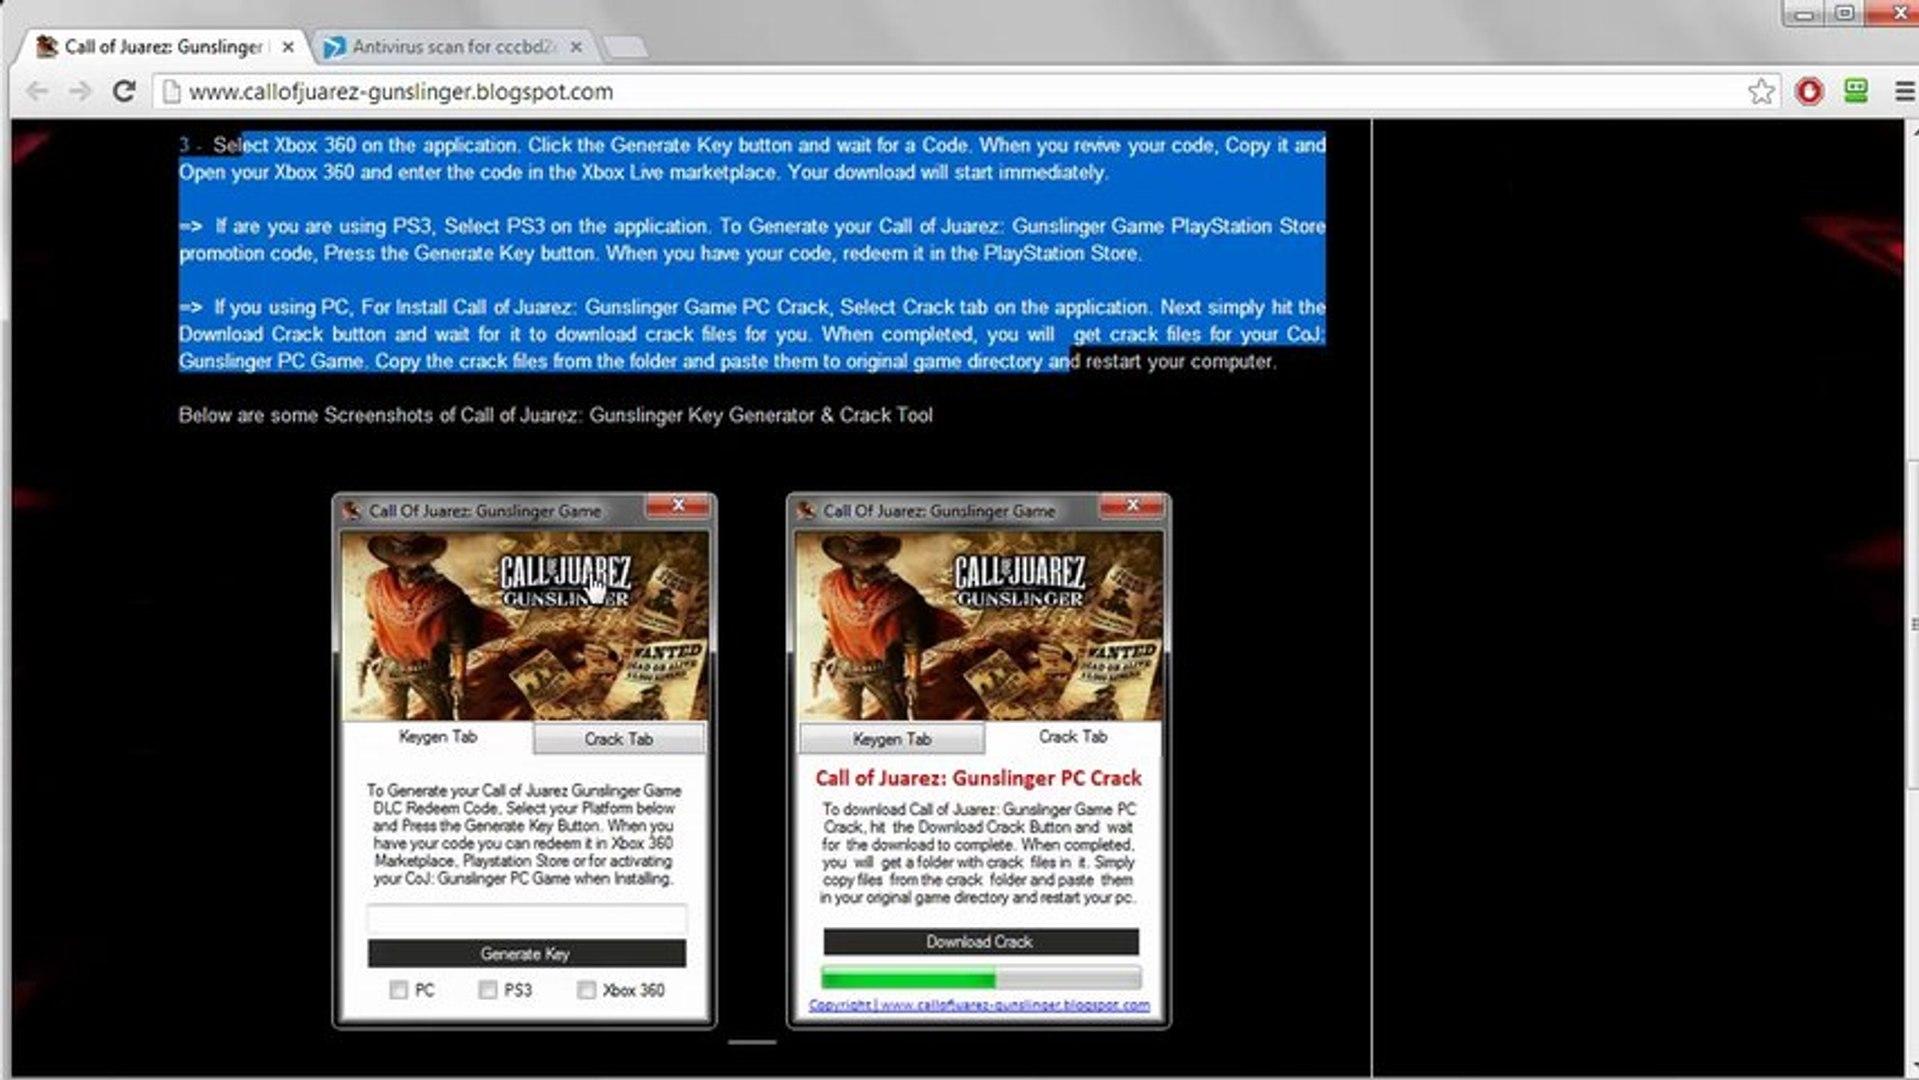 How to get the Call of Juarez: Gunslinger Full Game For Free